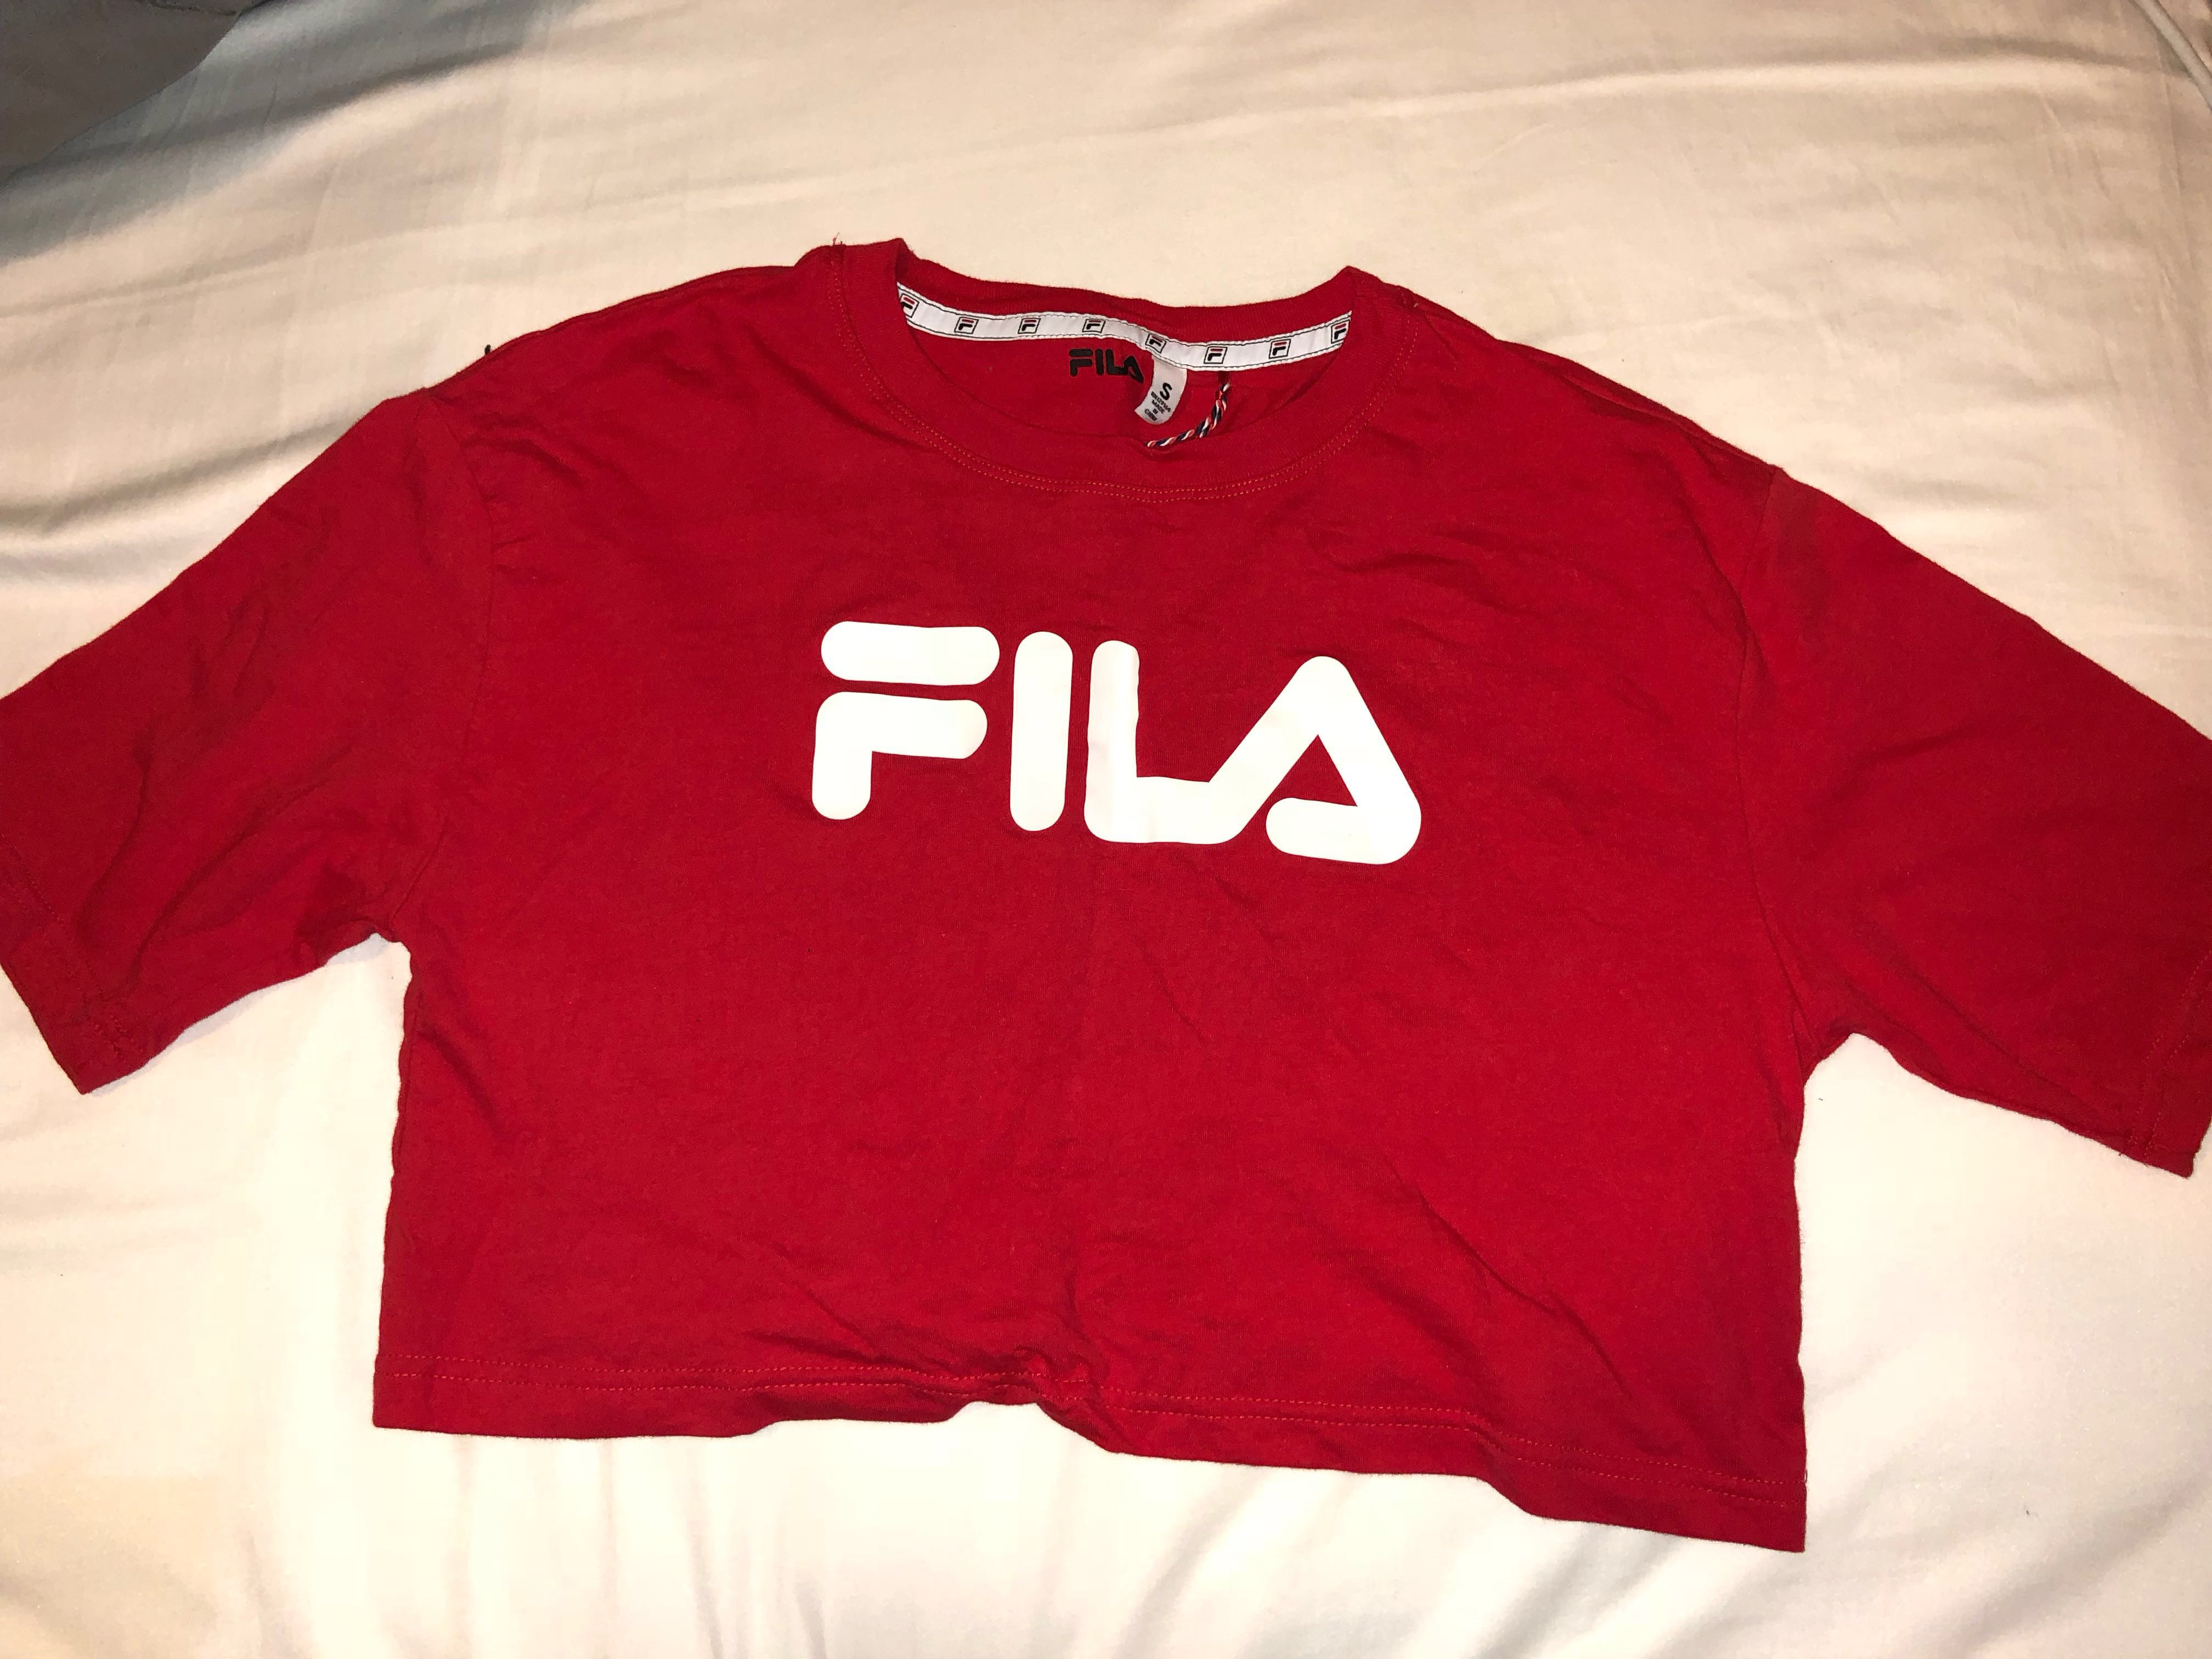 RED FILA CROP TOP